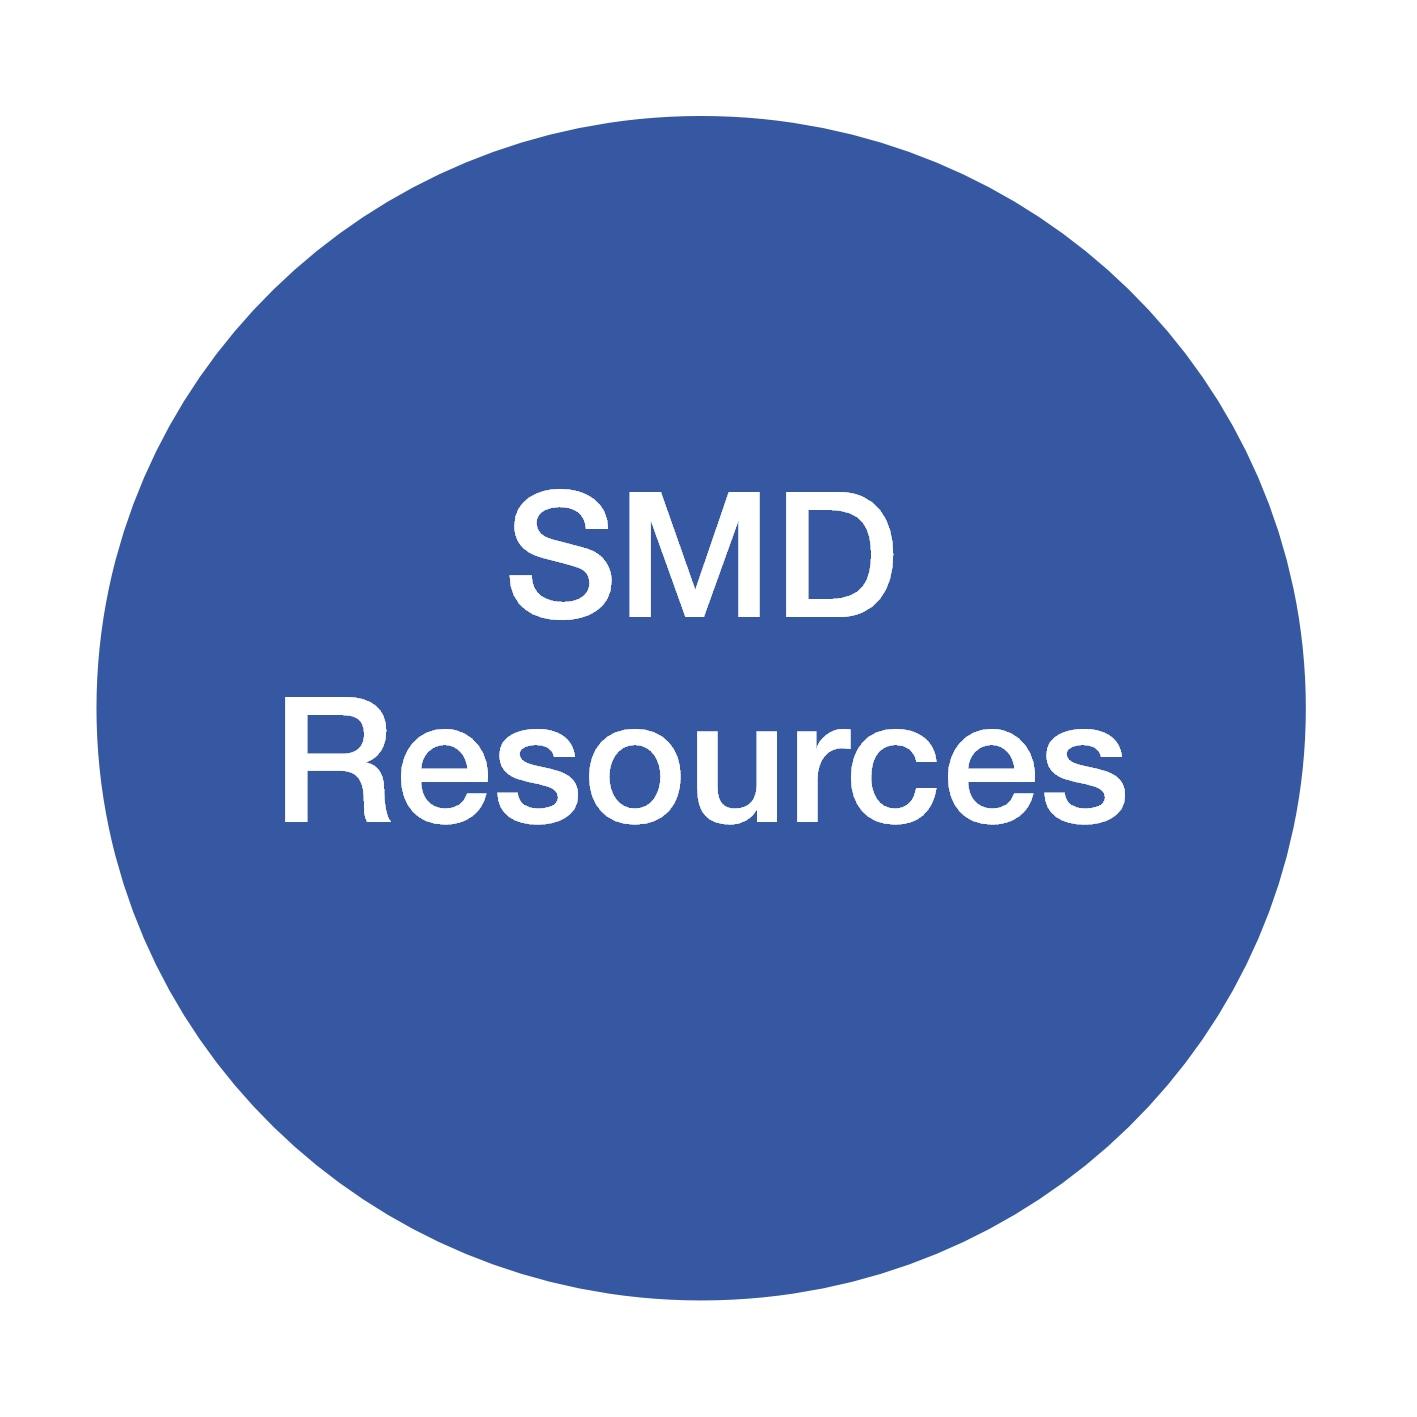 SMD resources (2).jpg